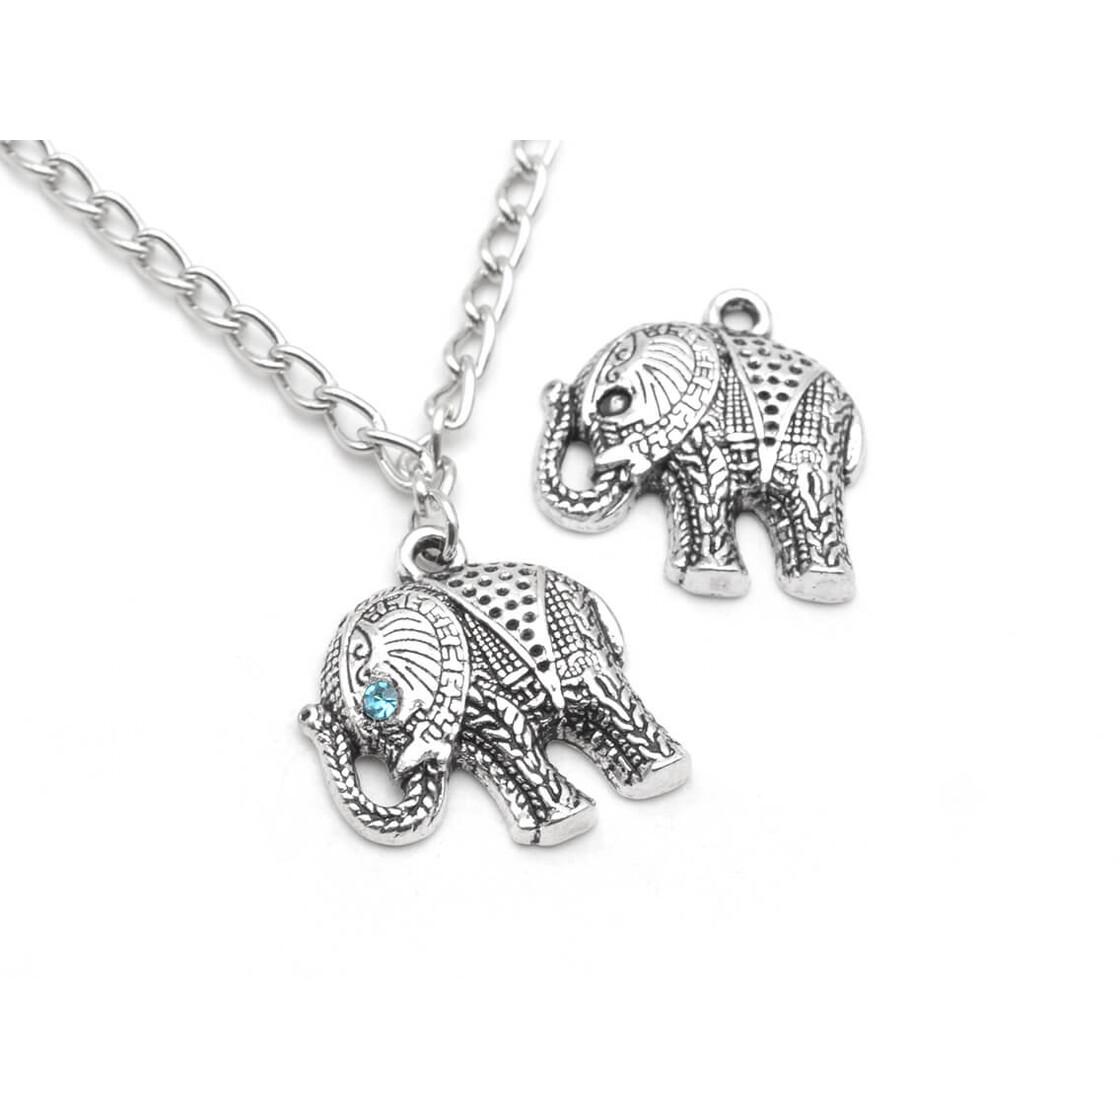 Kette Elefant Anhänger XXL Antik Silber Halskette Elefanten